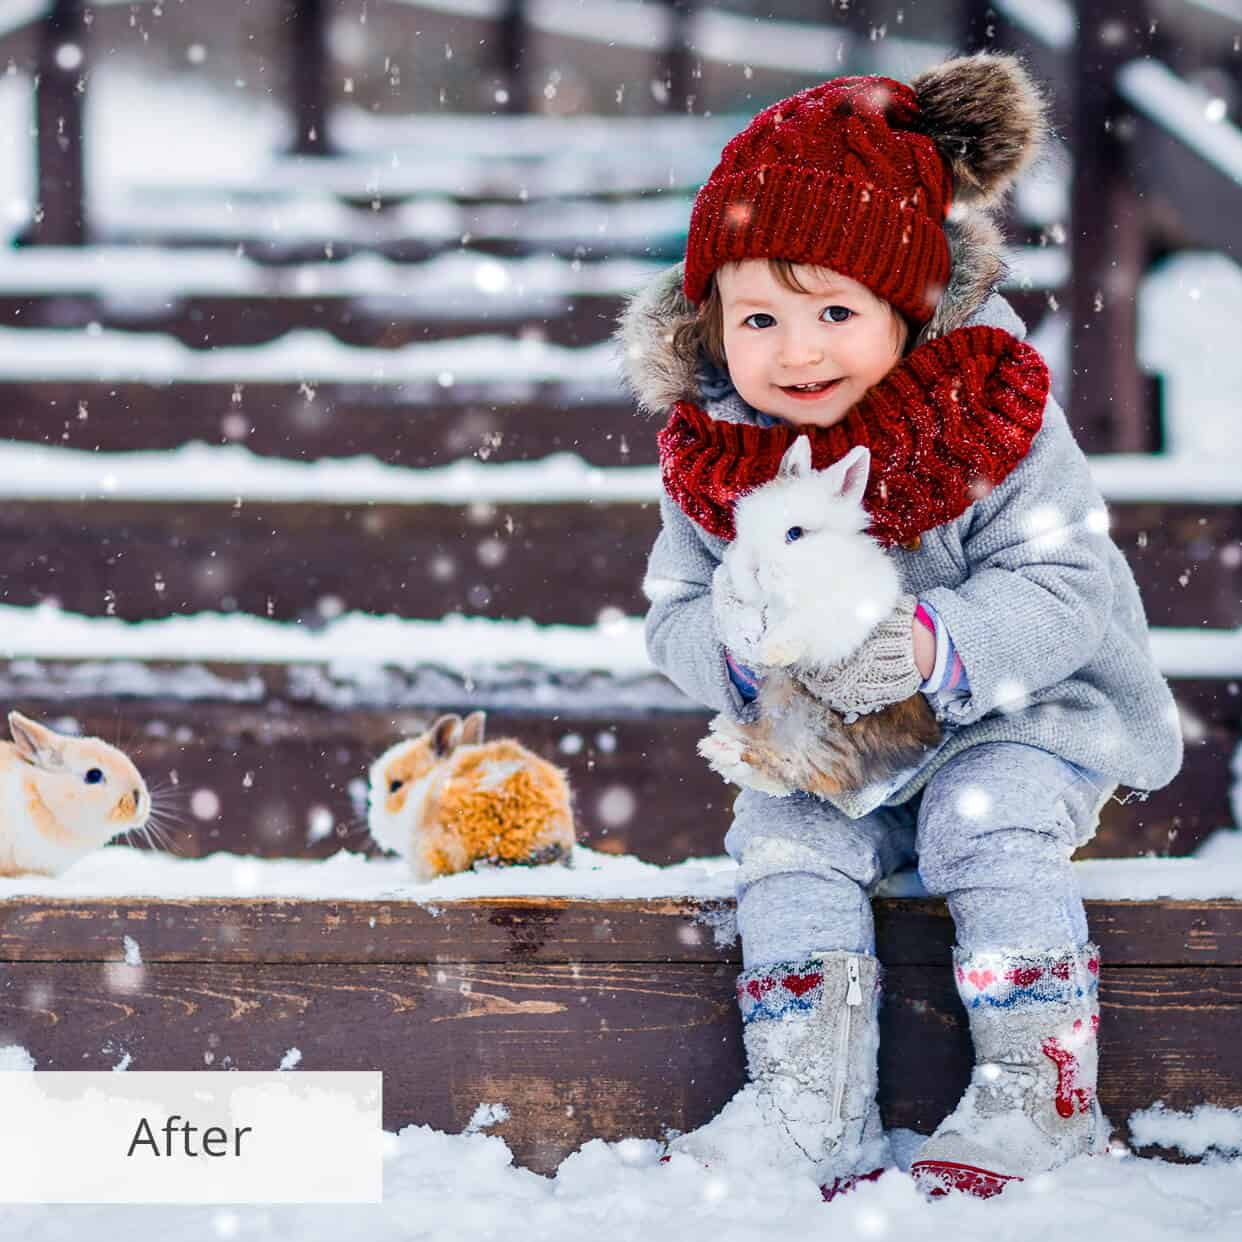 Preset Snow Shine for lightroom